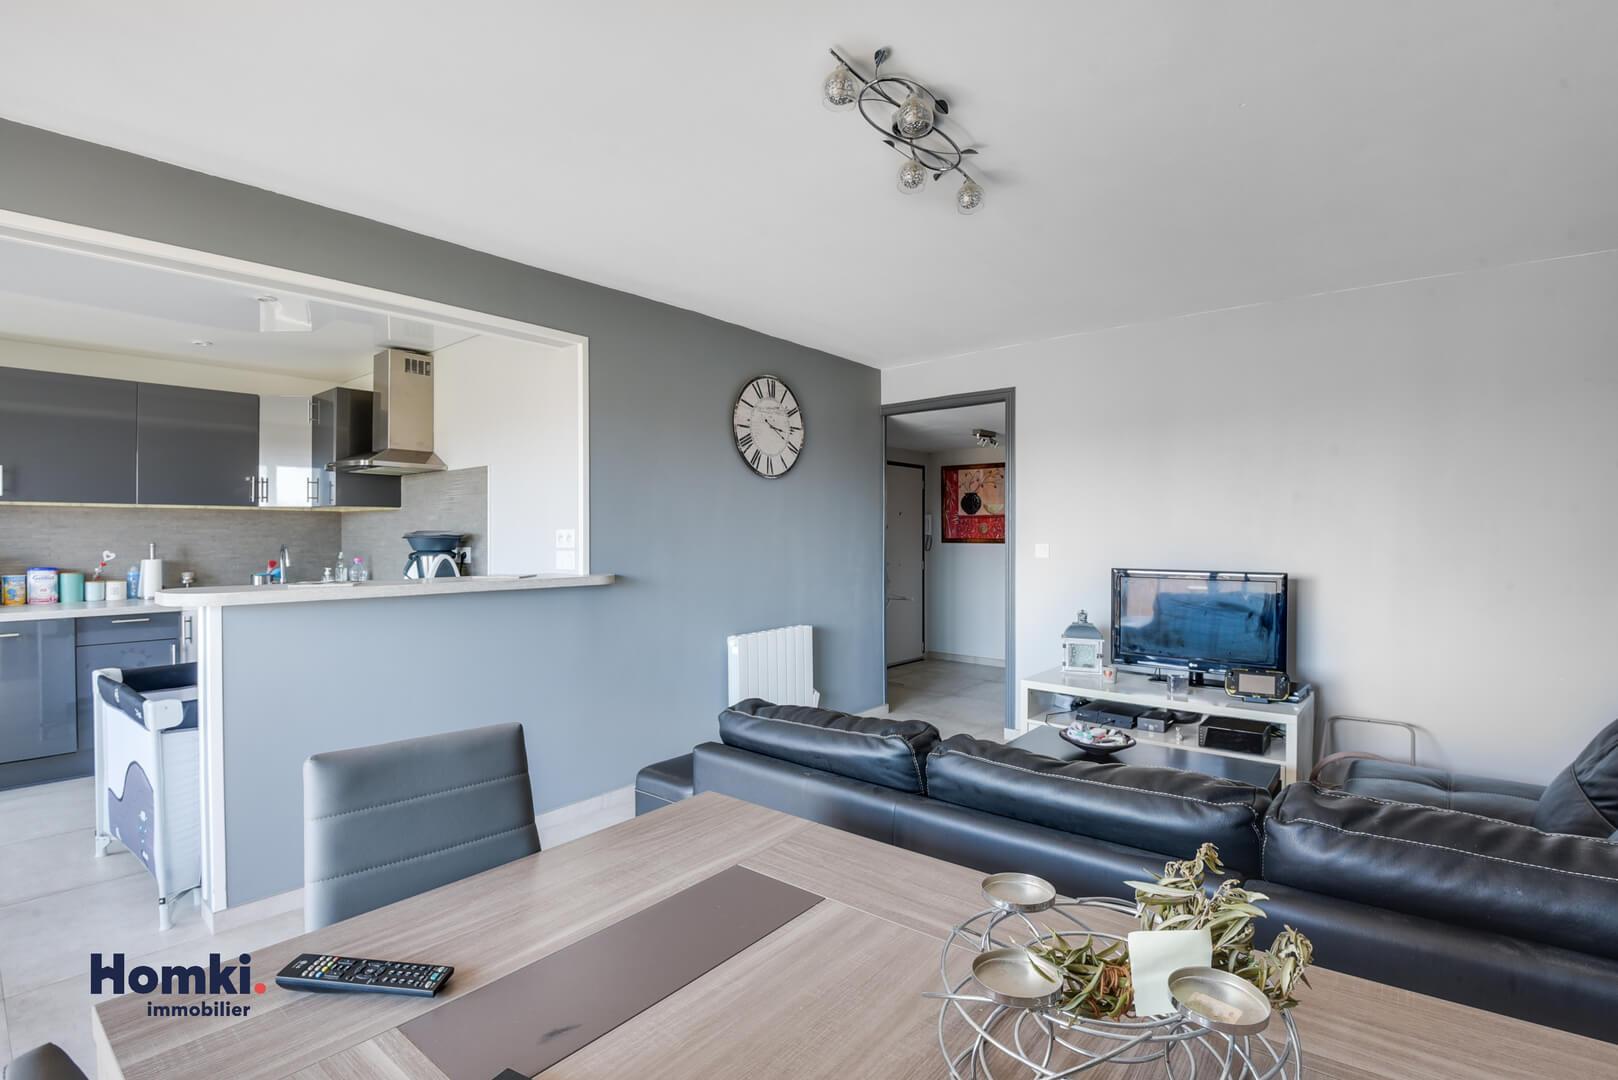 Vente Appartement 72 m² T3 13014 Marseille_1